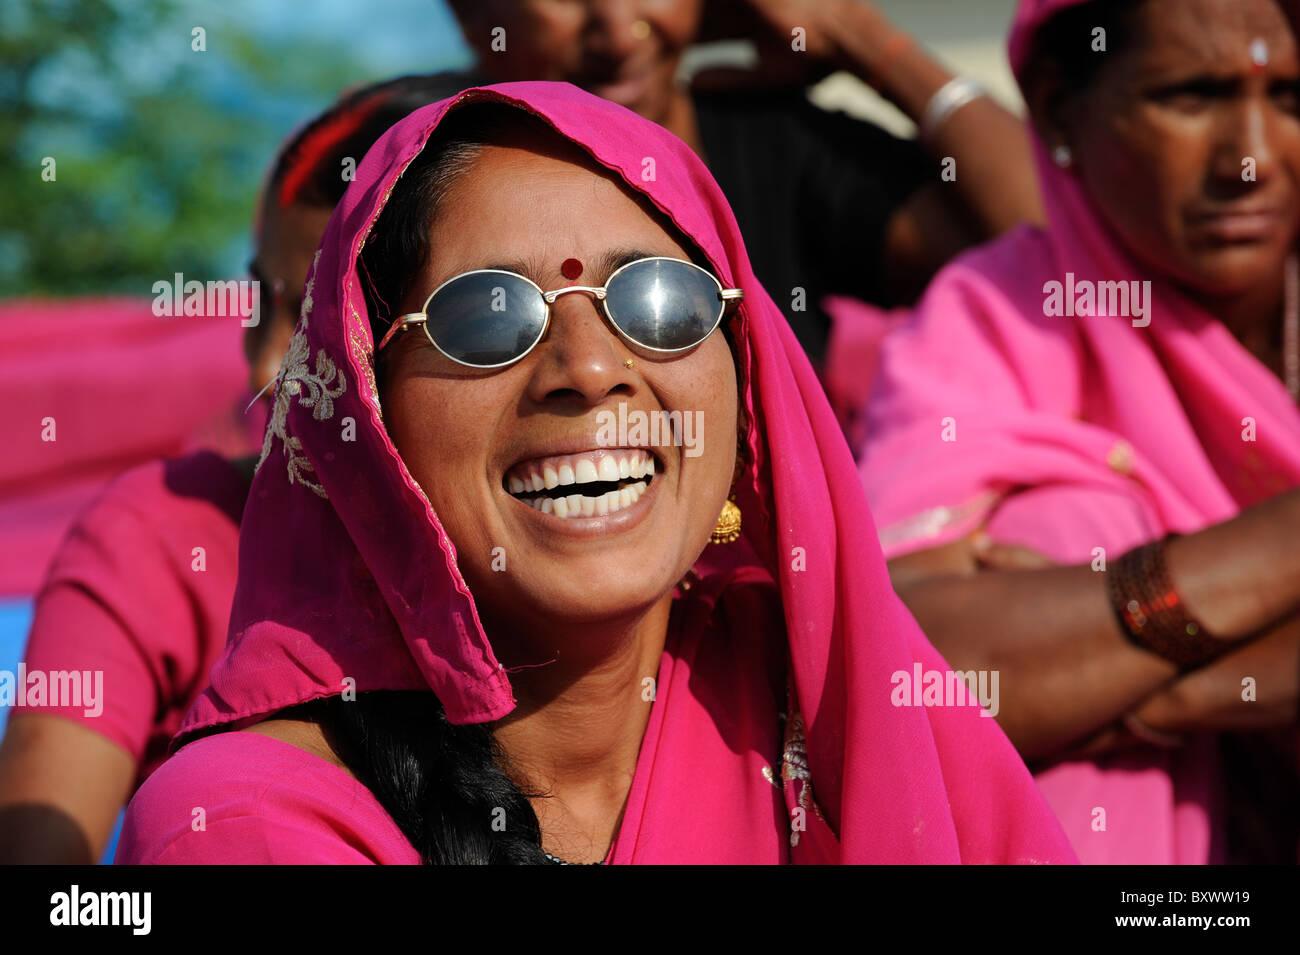 India UP city Banda , rally of women movement Gulabi gang of leader Sampat Pal Devi, the women in pink sari fight - Stock Image